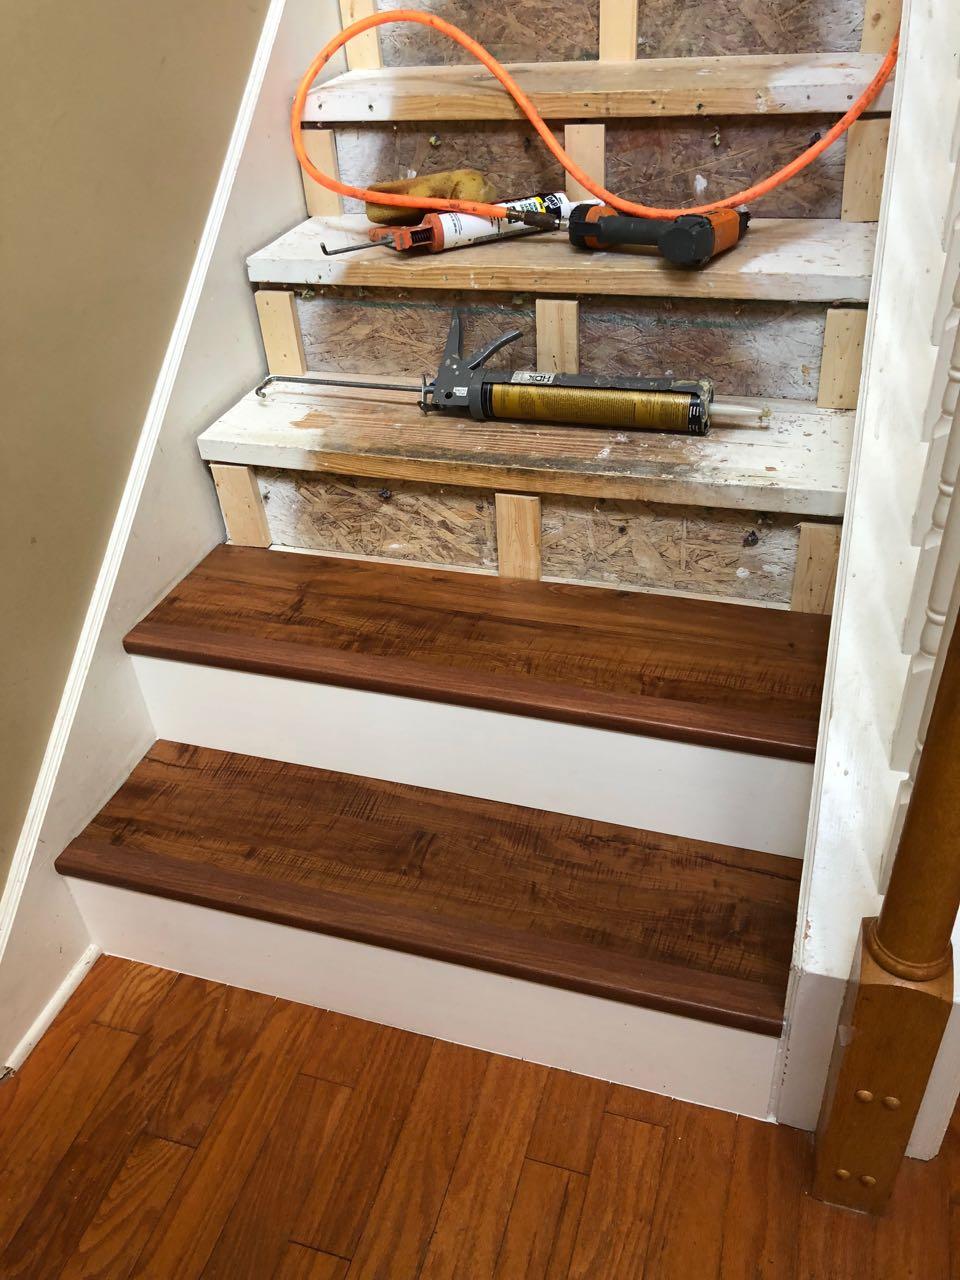 New Steps